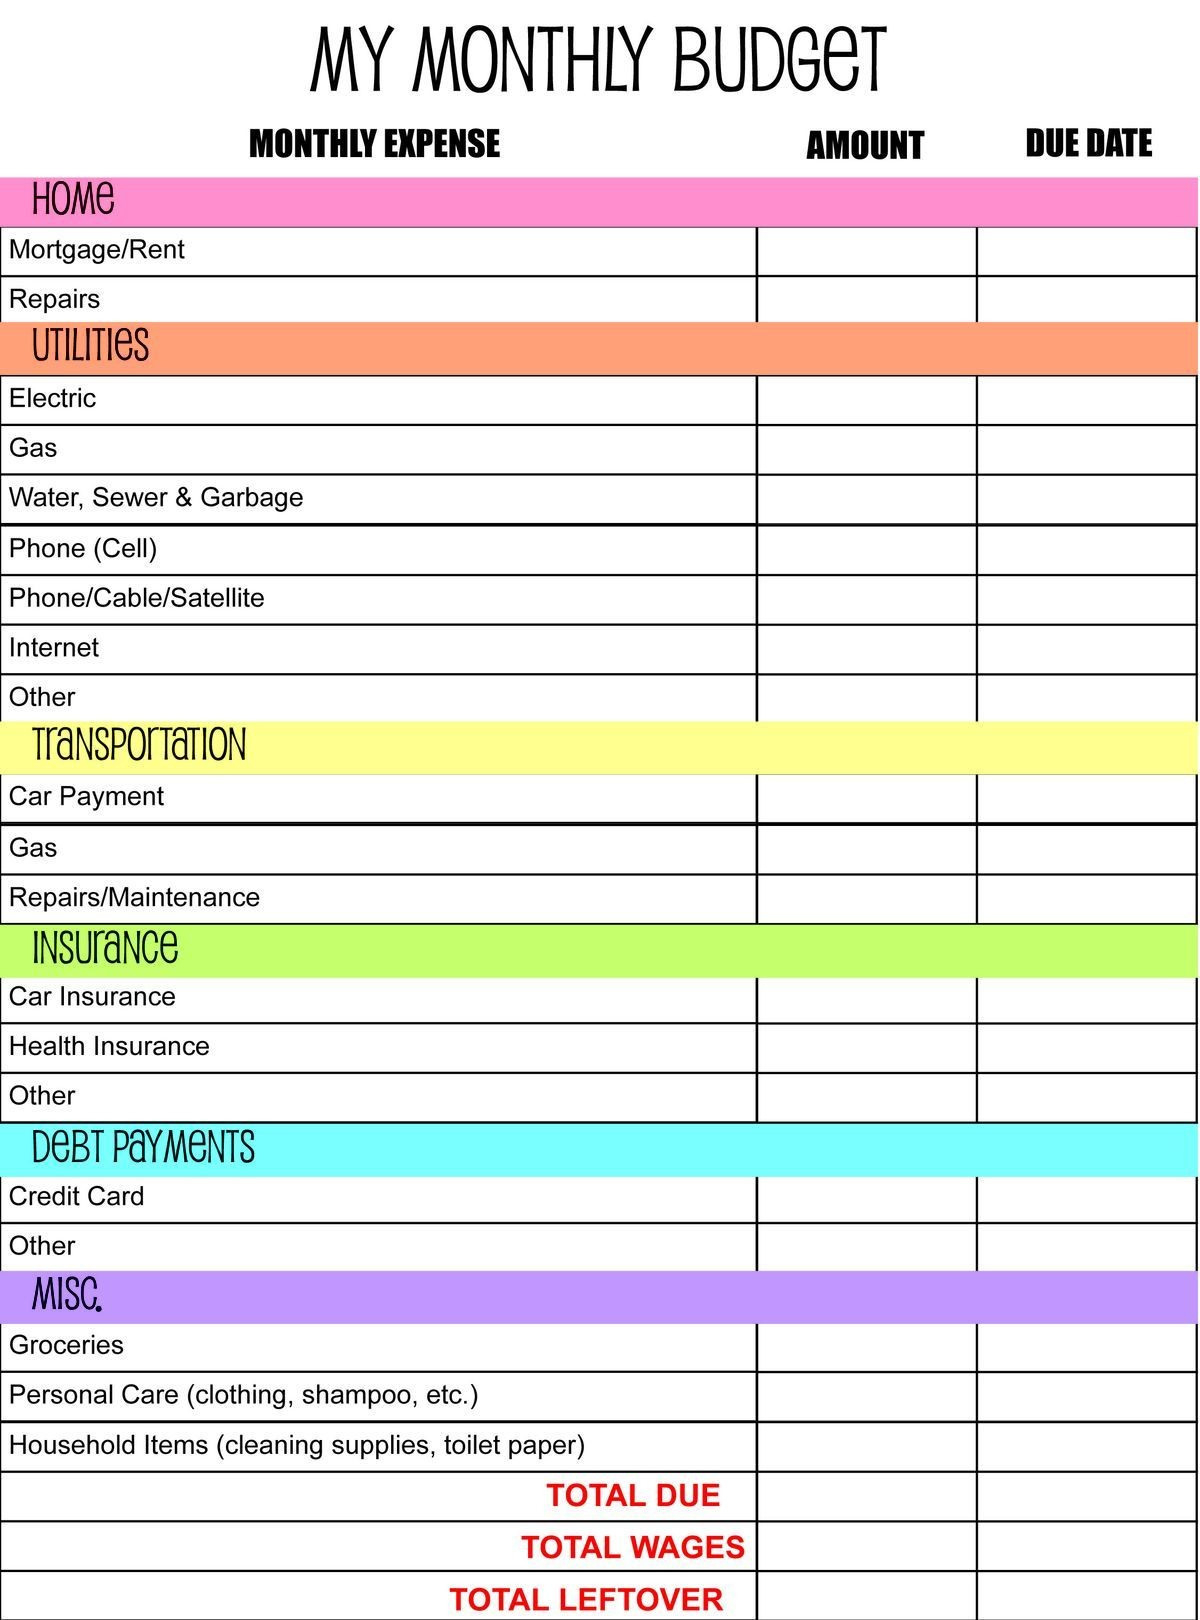 Turbotap Financial Planning Worksheet — db excel.com